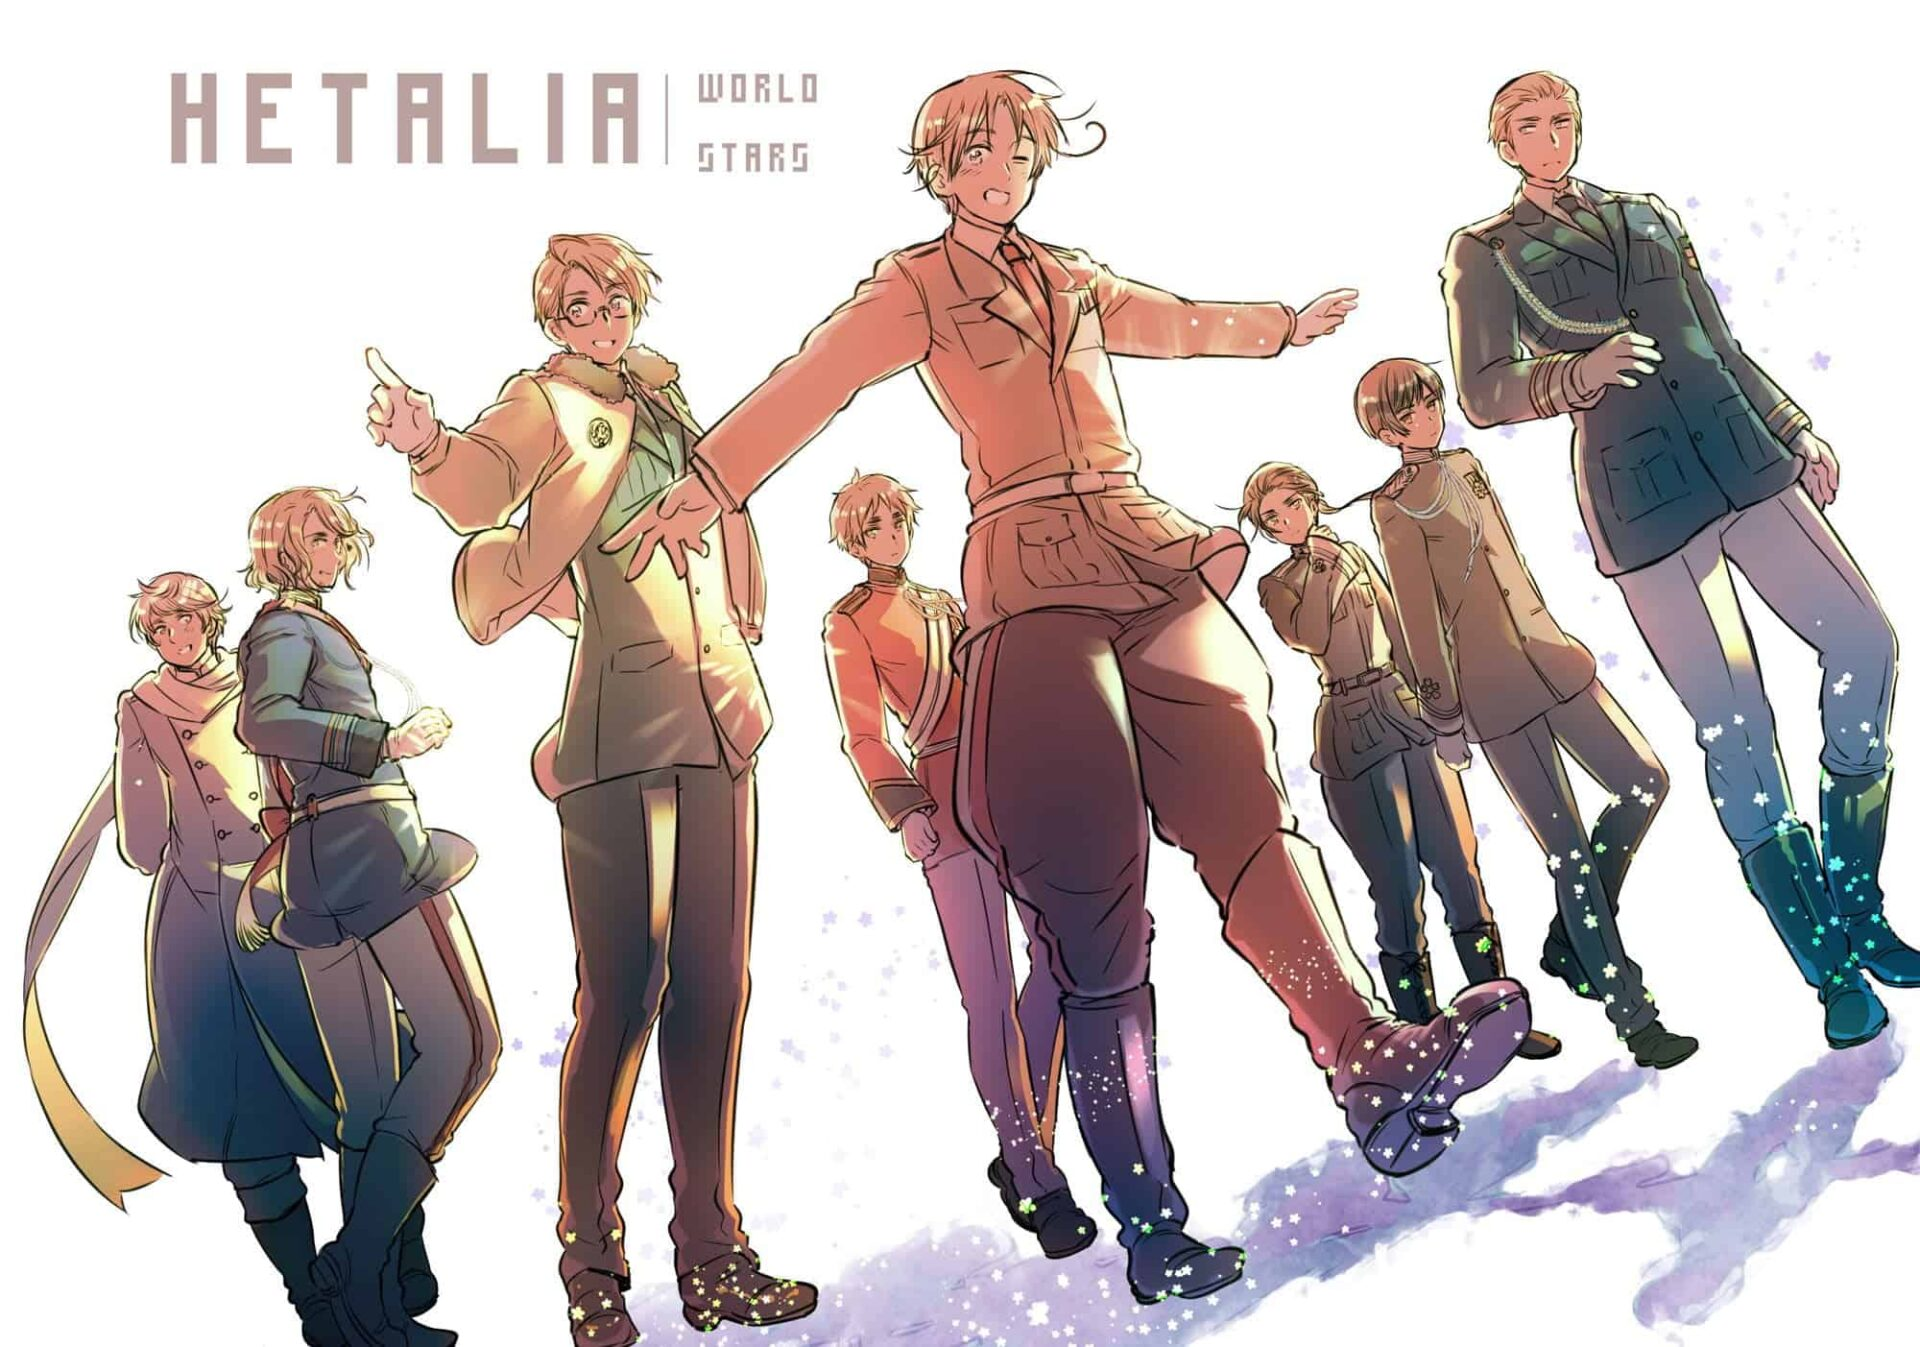 Hetalia: World Stars Anime